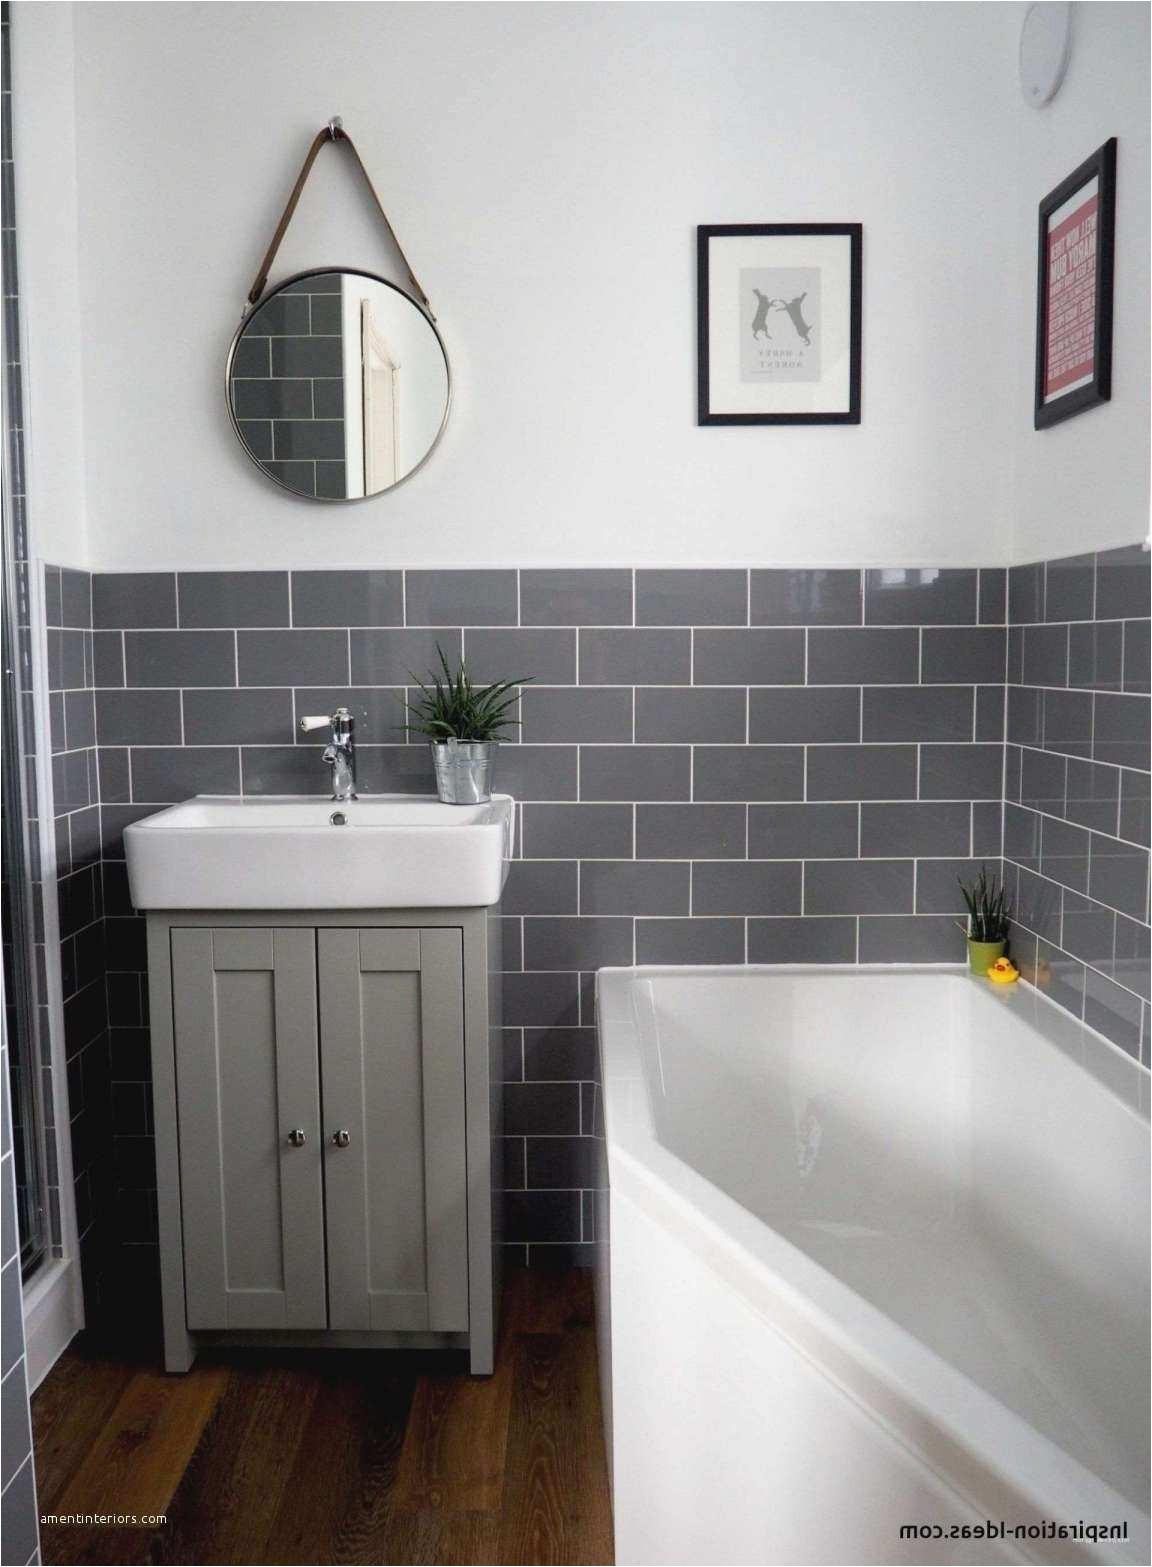 Modern Bathroom Design Ideas Small Spaces Fresh Small Modern Bathroom Design Bathroom Ideas